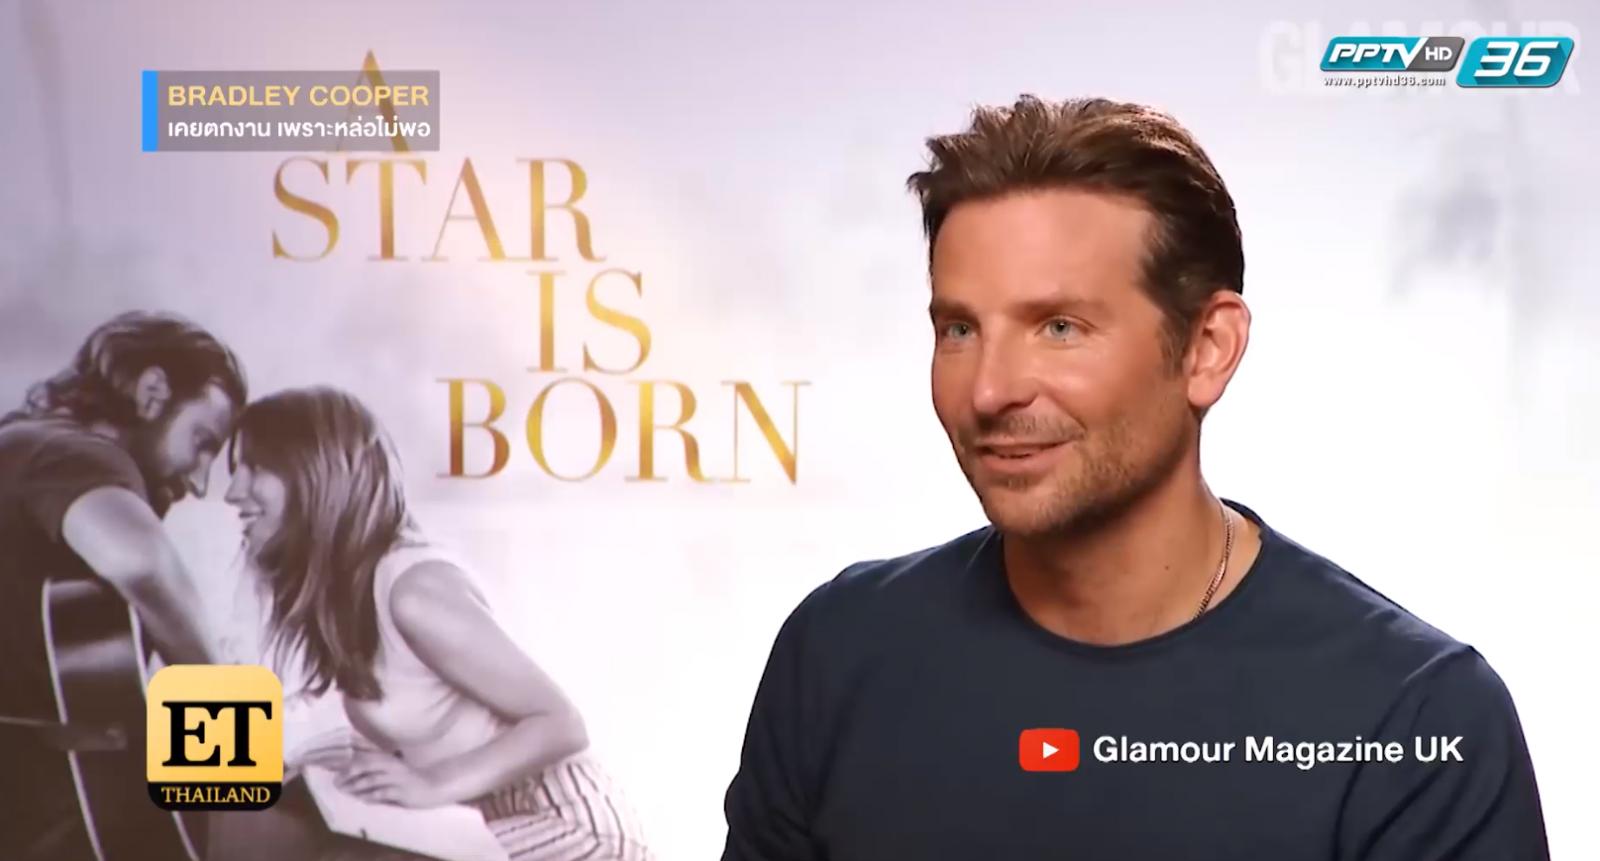 """Bradley Cooper"" เคยตกงาน เพราะหล่อไม่พอ"